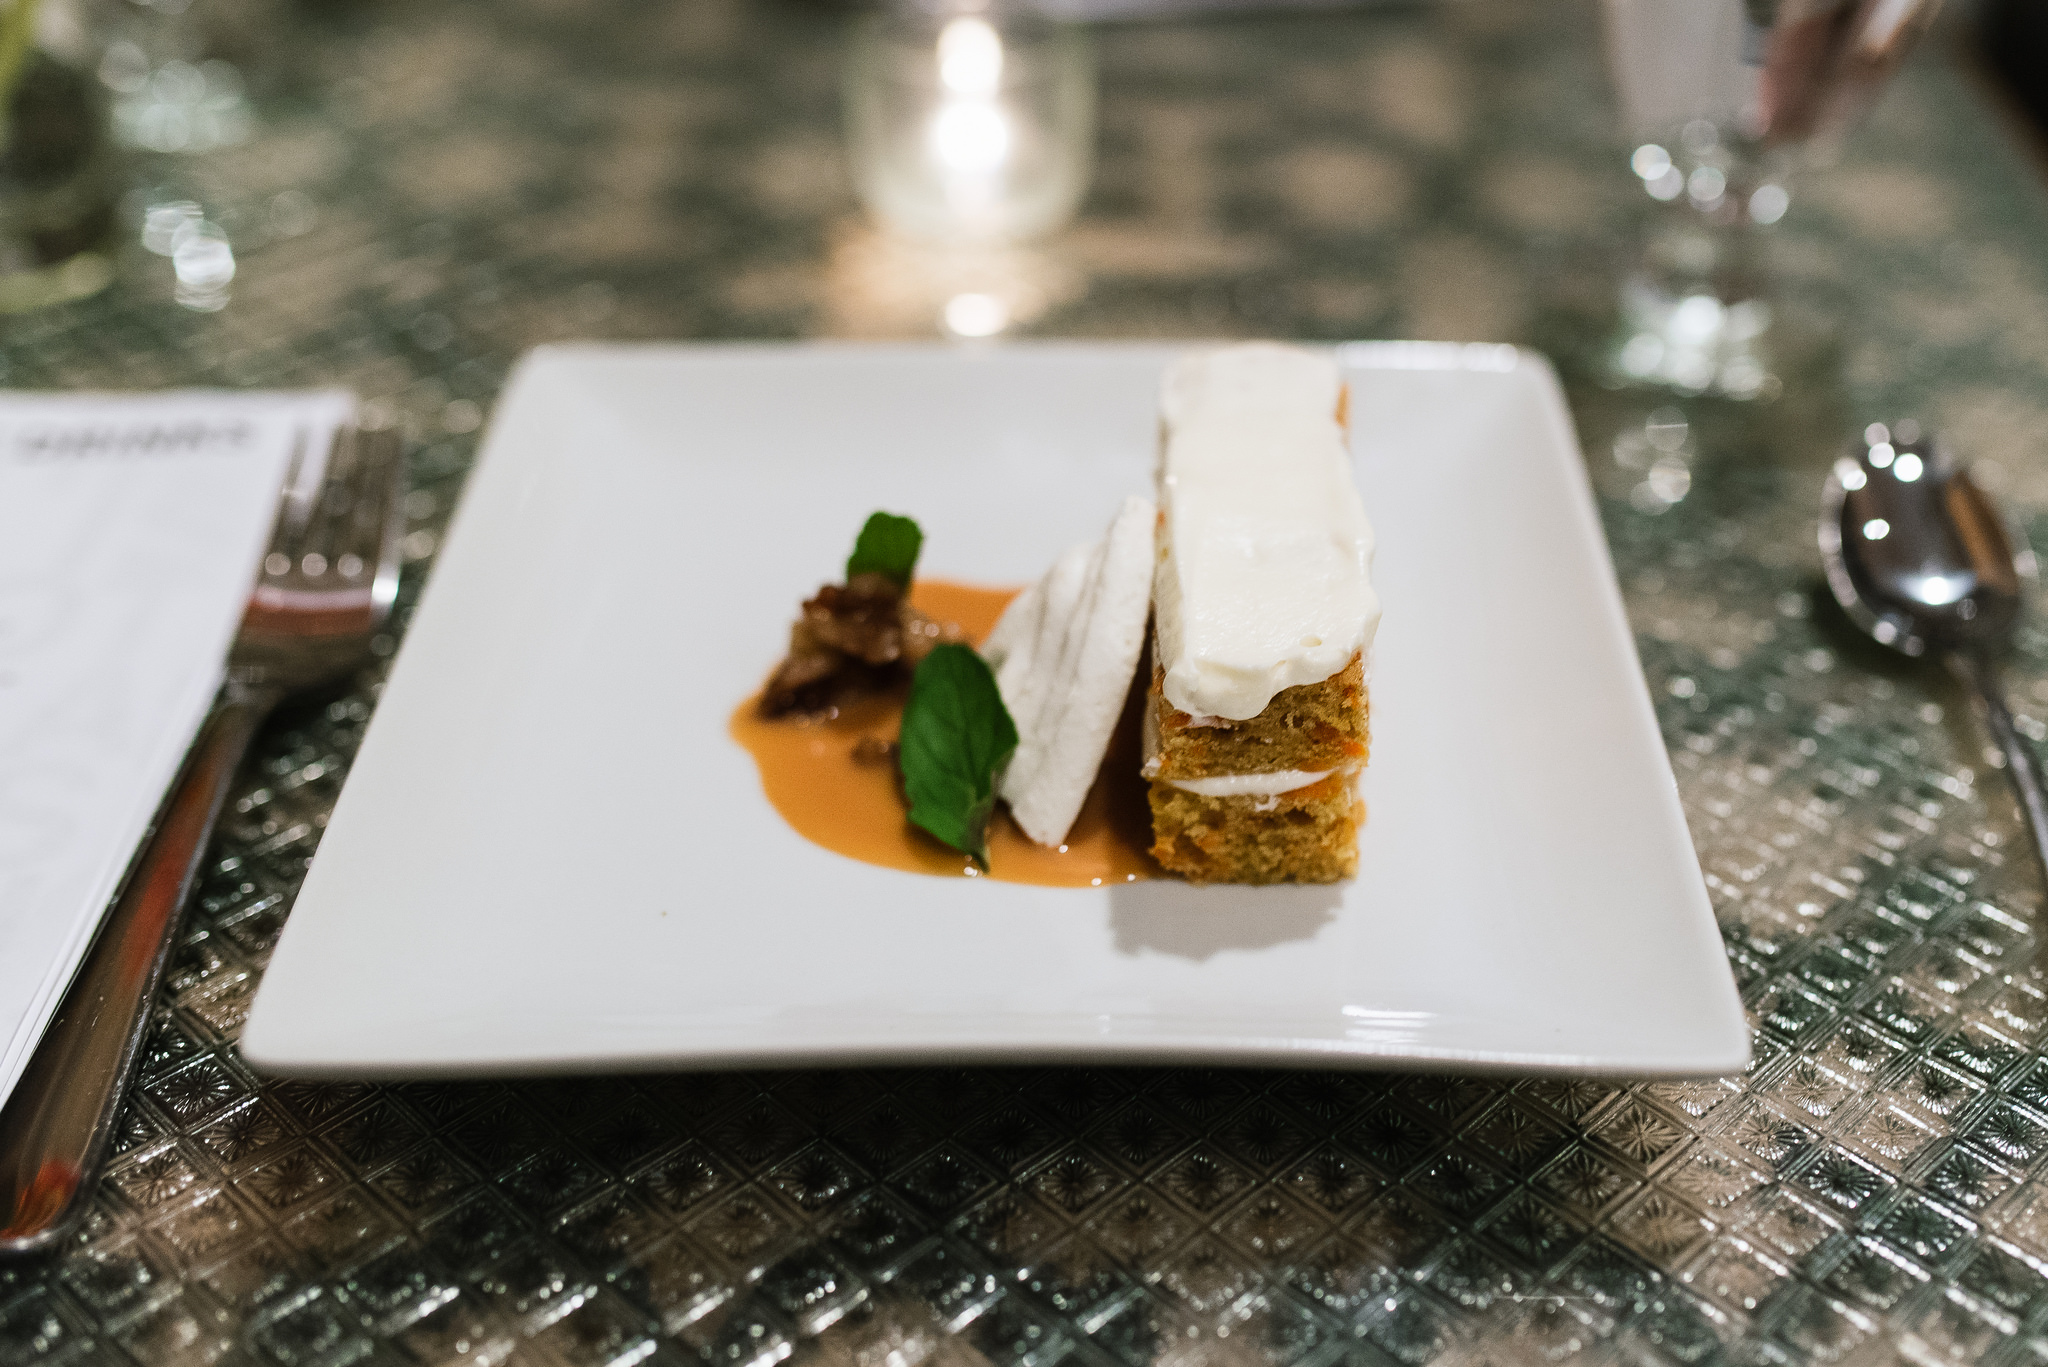 chris bolyard's carrot cake and meringue